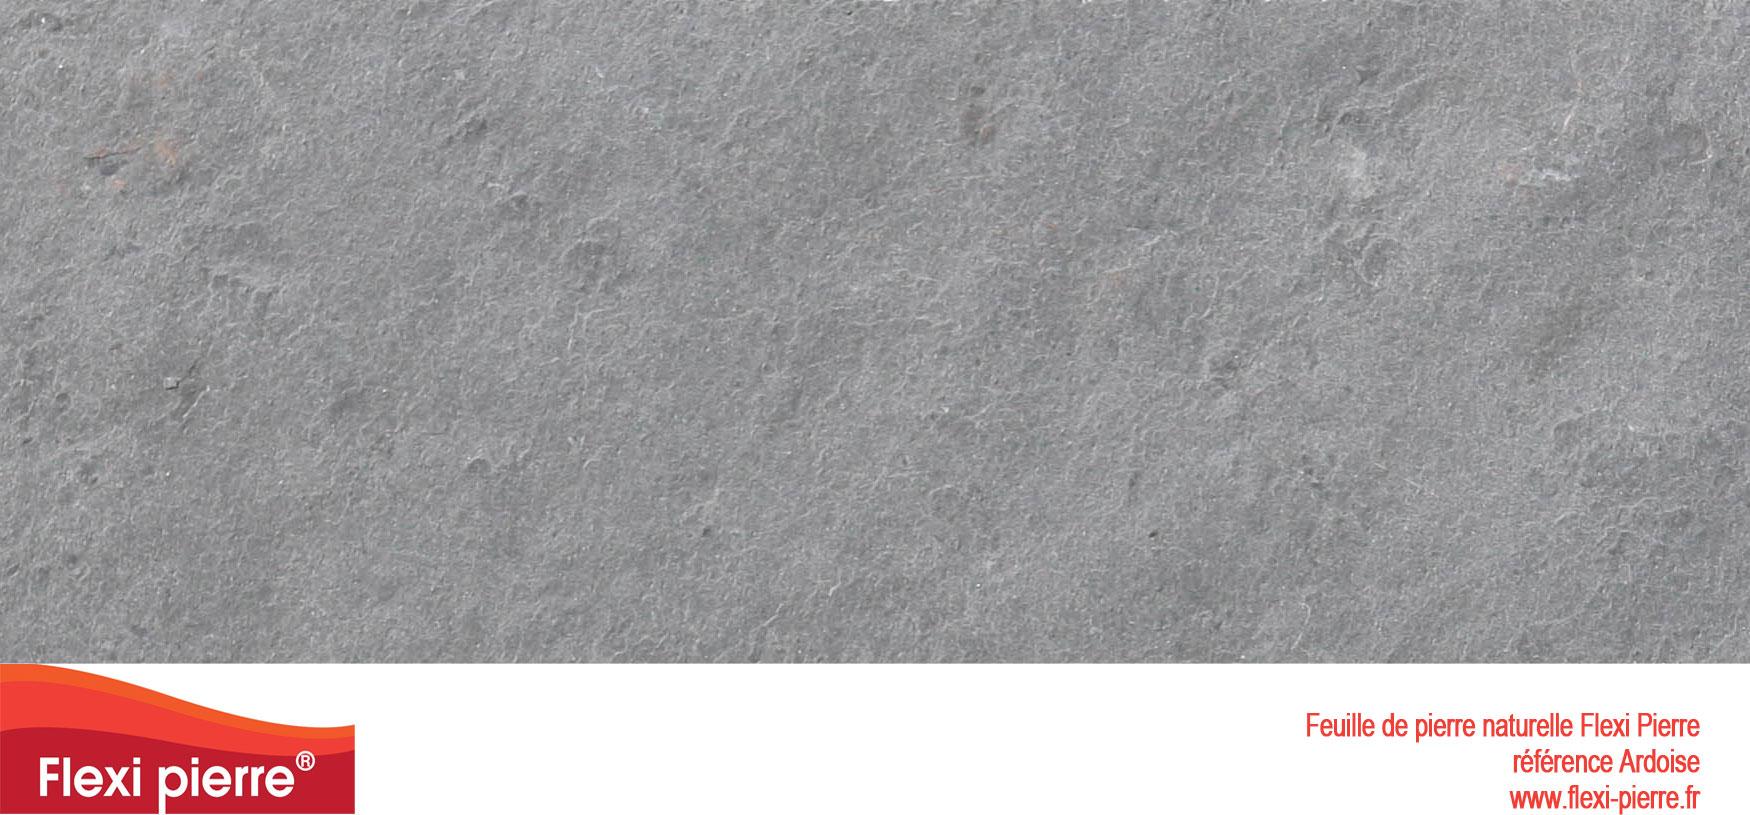 Feuille de pierre ardoise